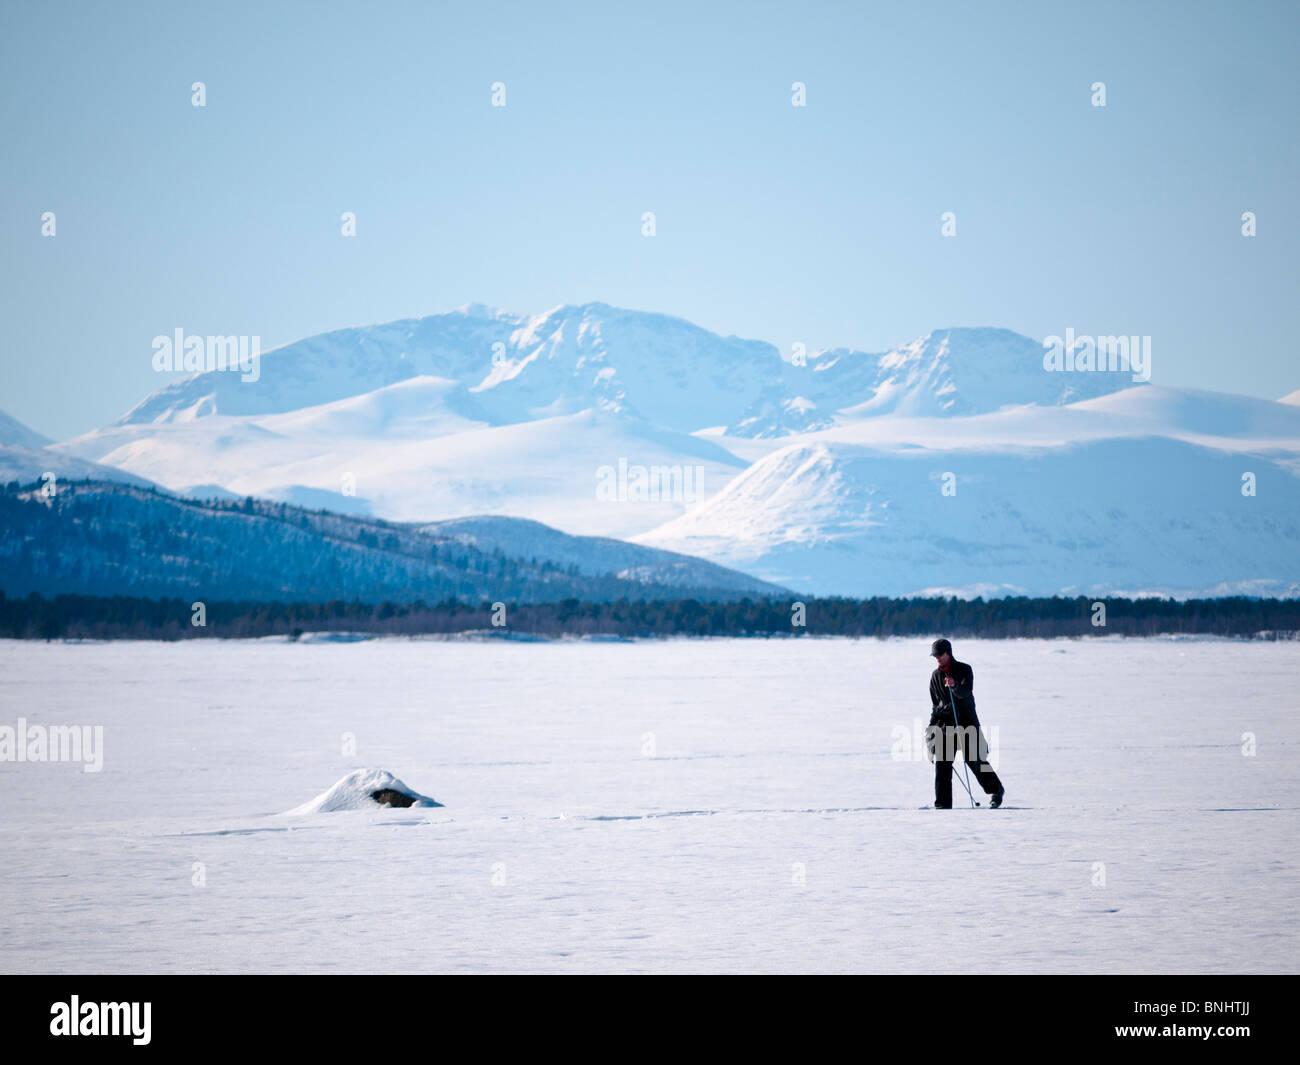 A skier makes his way above the frozen Kaalasjärvi lake in front of the Kebnekaise massif in Kiruna, Lapland, - Stock Image